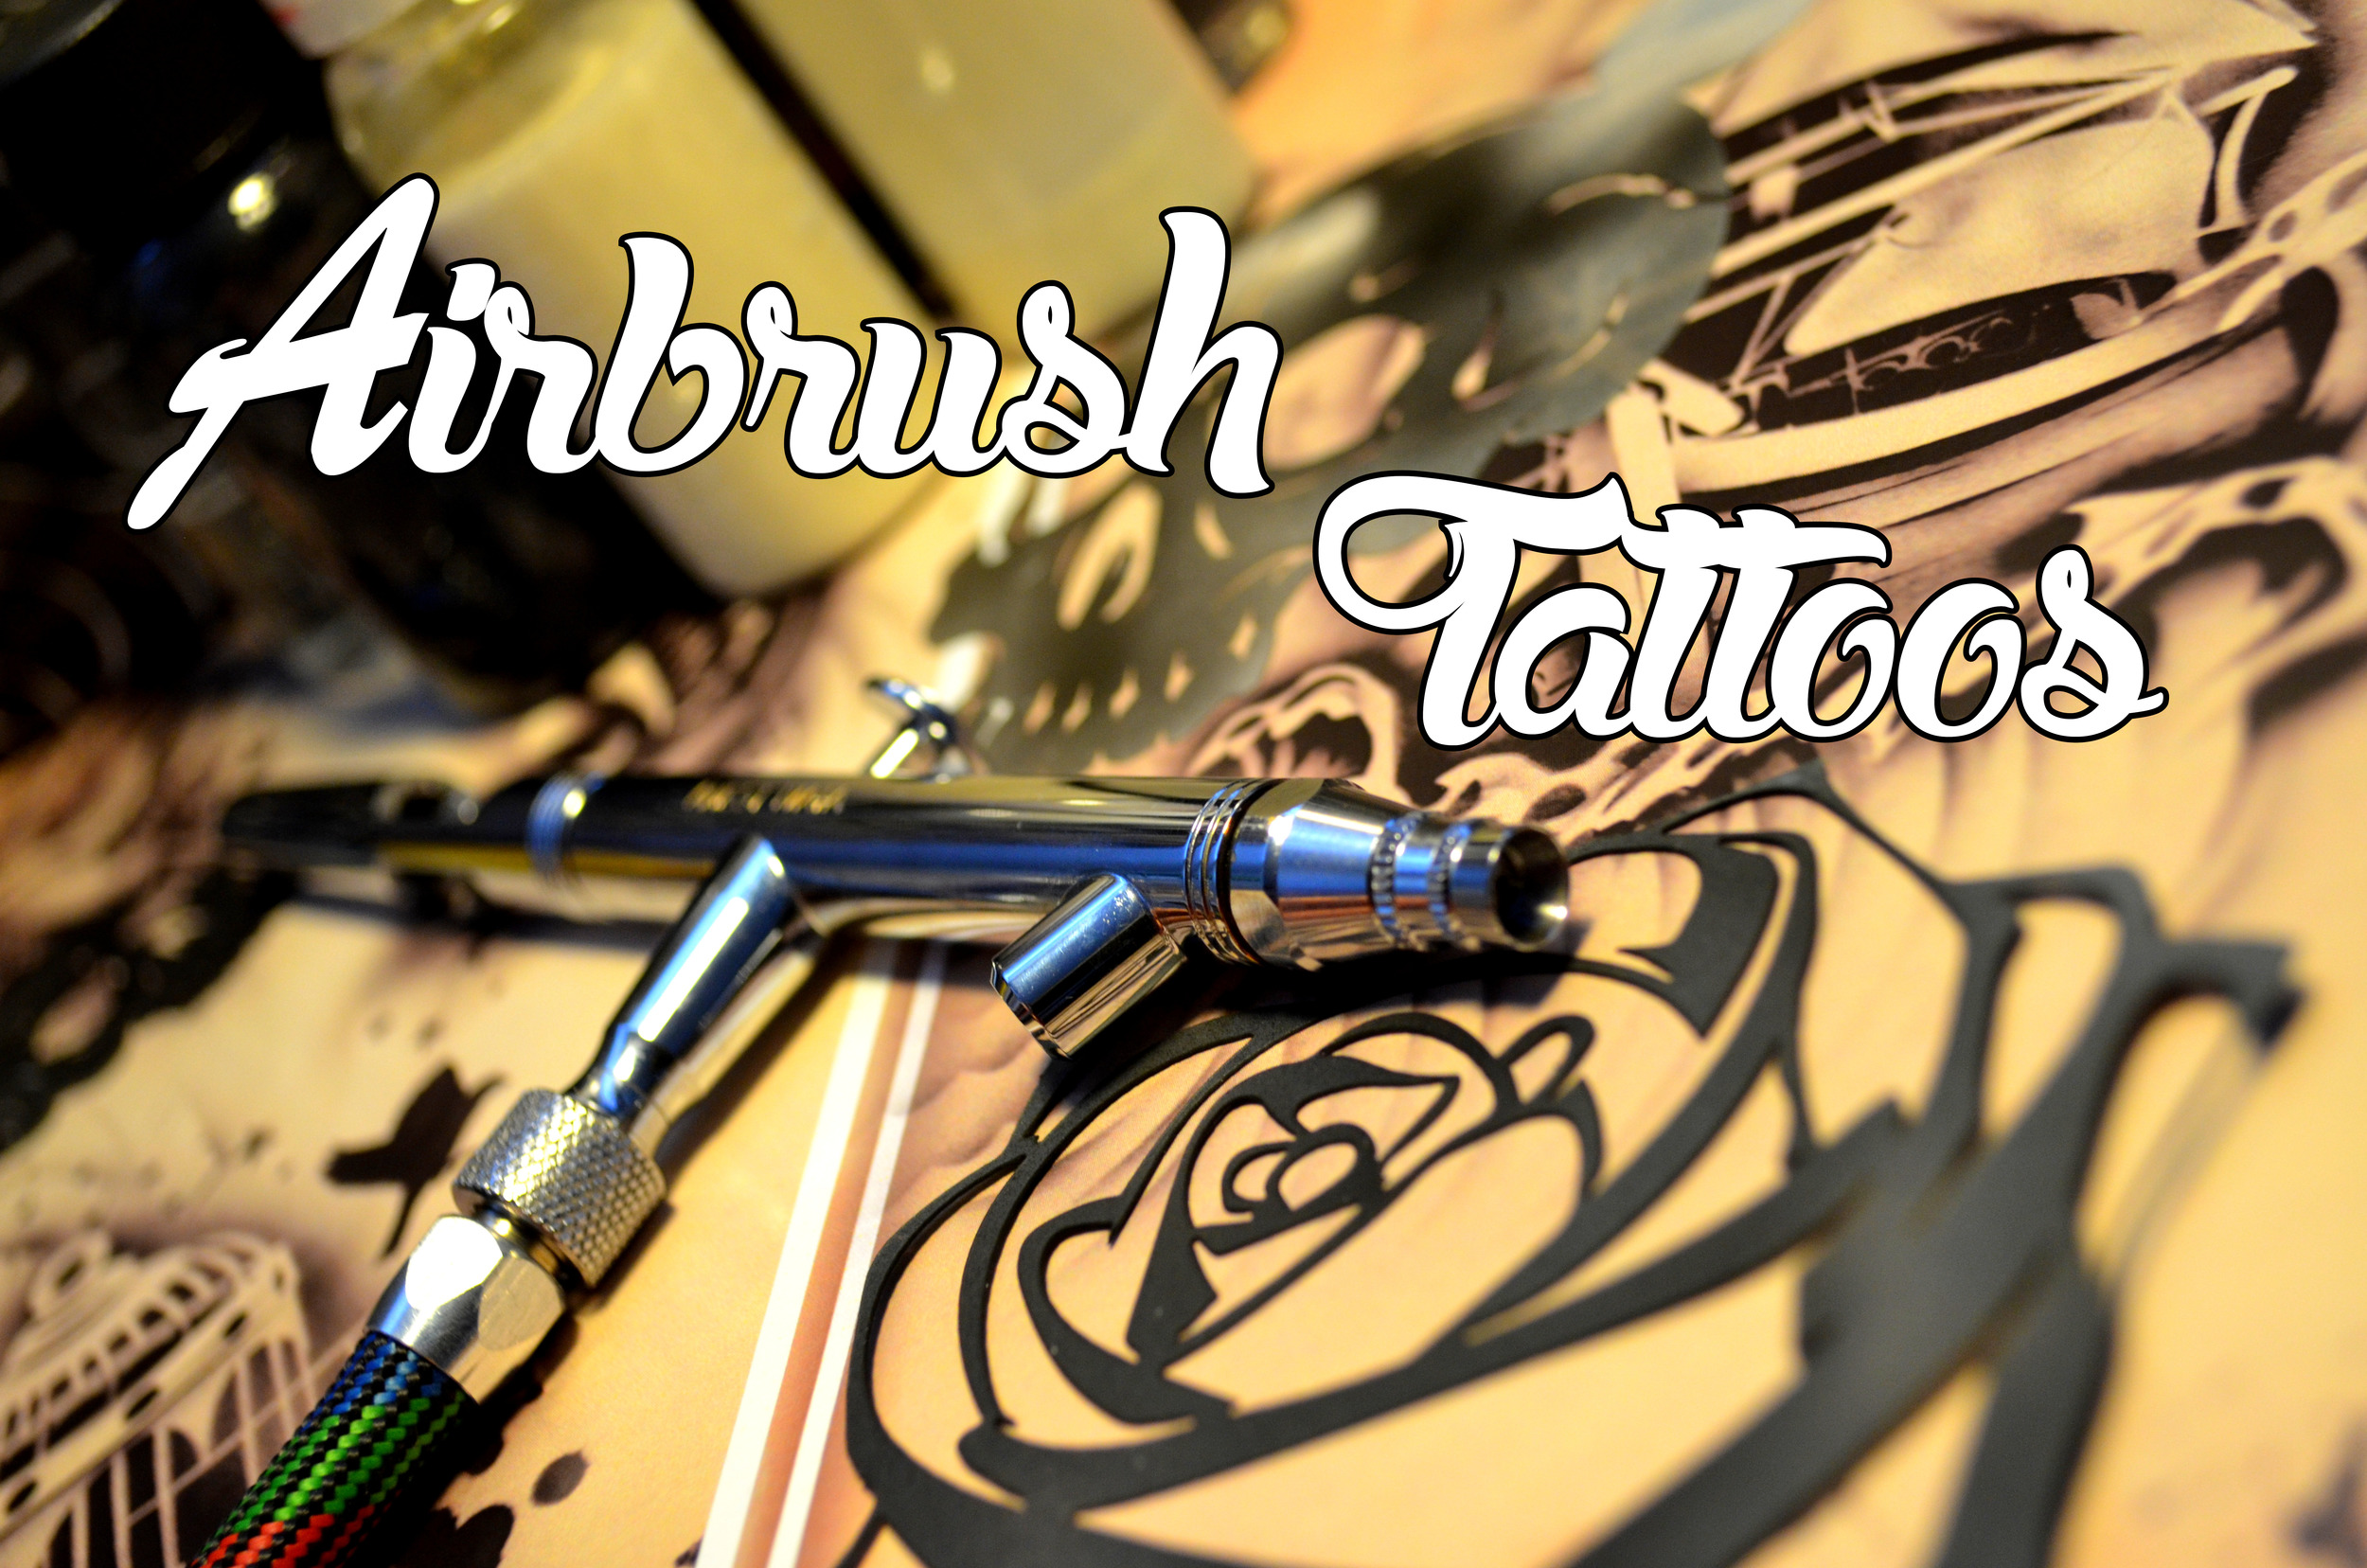 airbrush tattoos 1.jpg